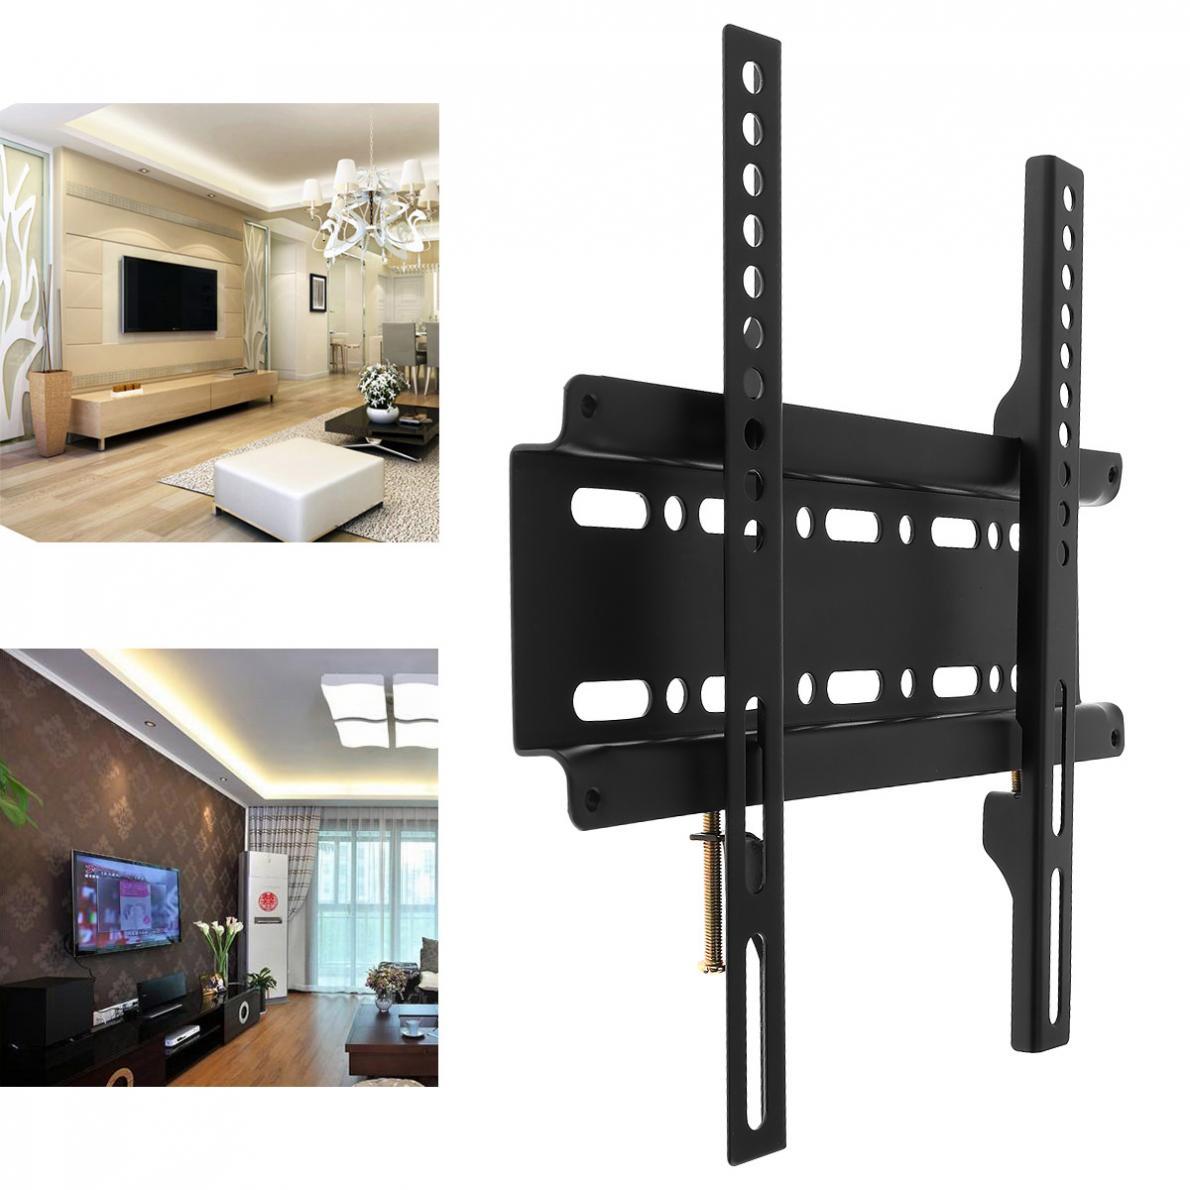 Universal TV soporte de montaje en pared Marco de TV para 12-37 pulgadas LCD Monitor LED de Panel plano de Plasma HDTV TV soporte